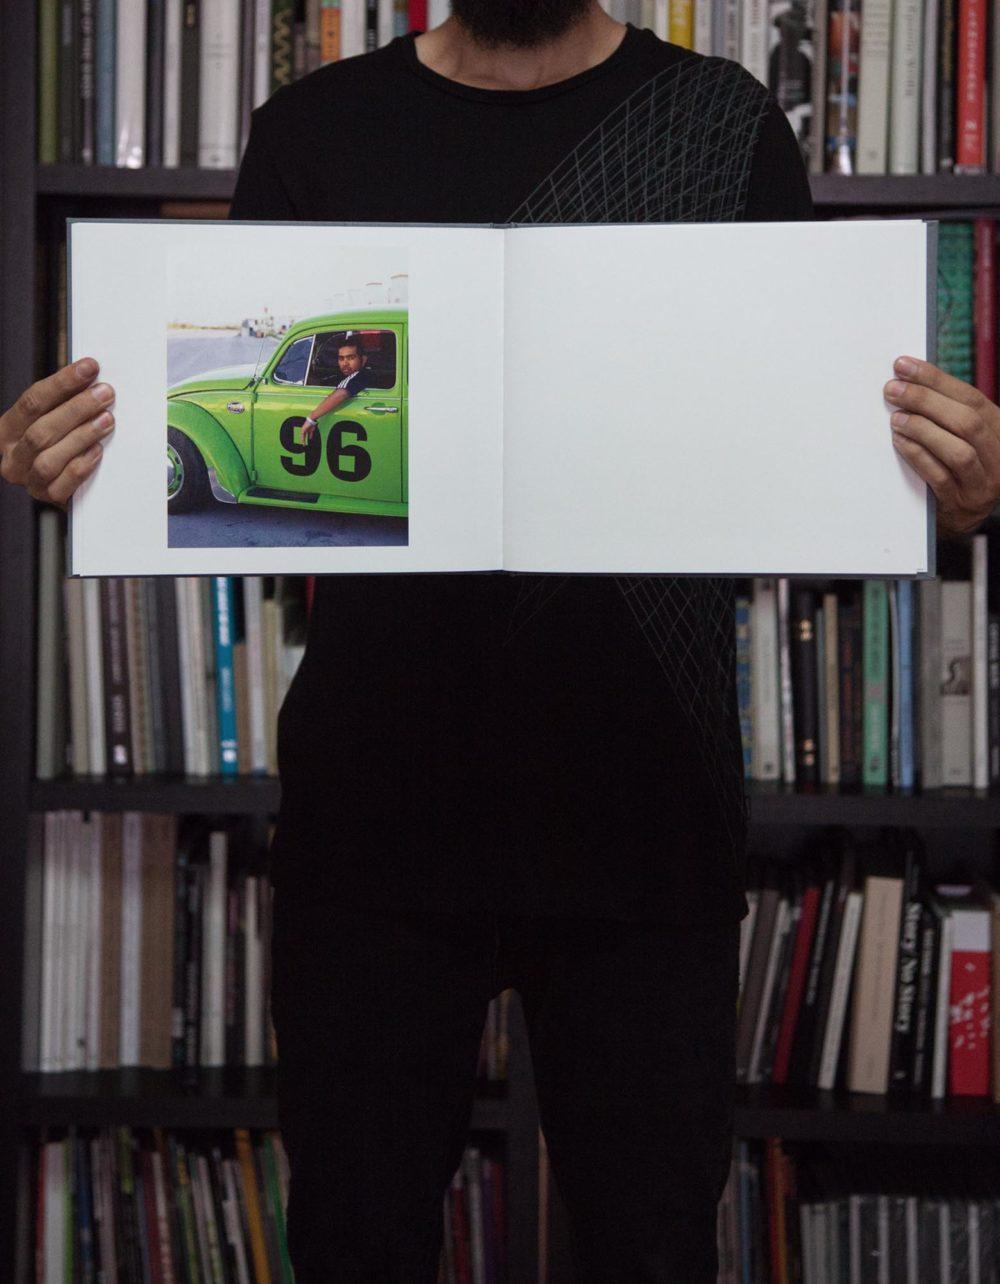 Suburbia Mexicana Book by Alejandro Cartagena, Published 2012 by Daylight, Photolucida